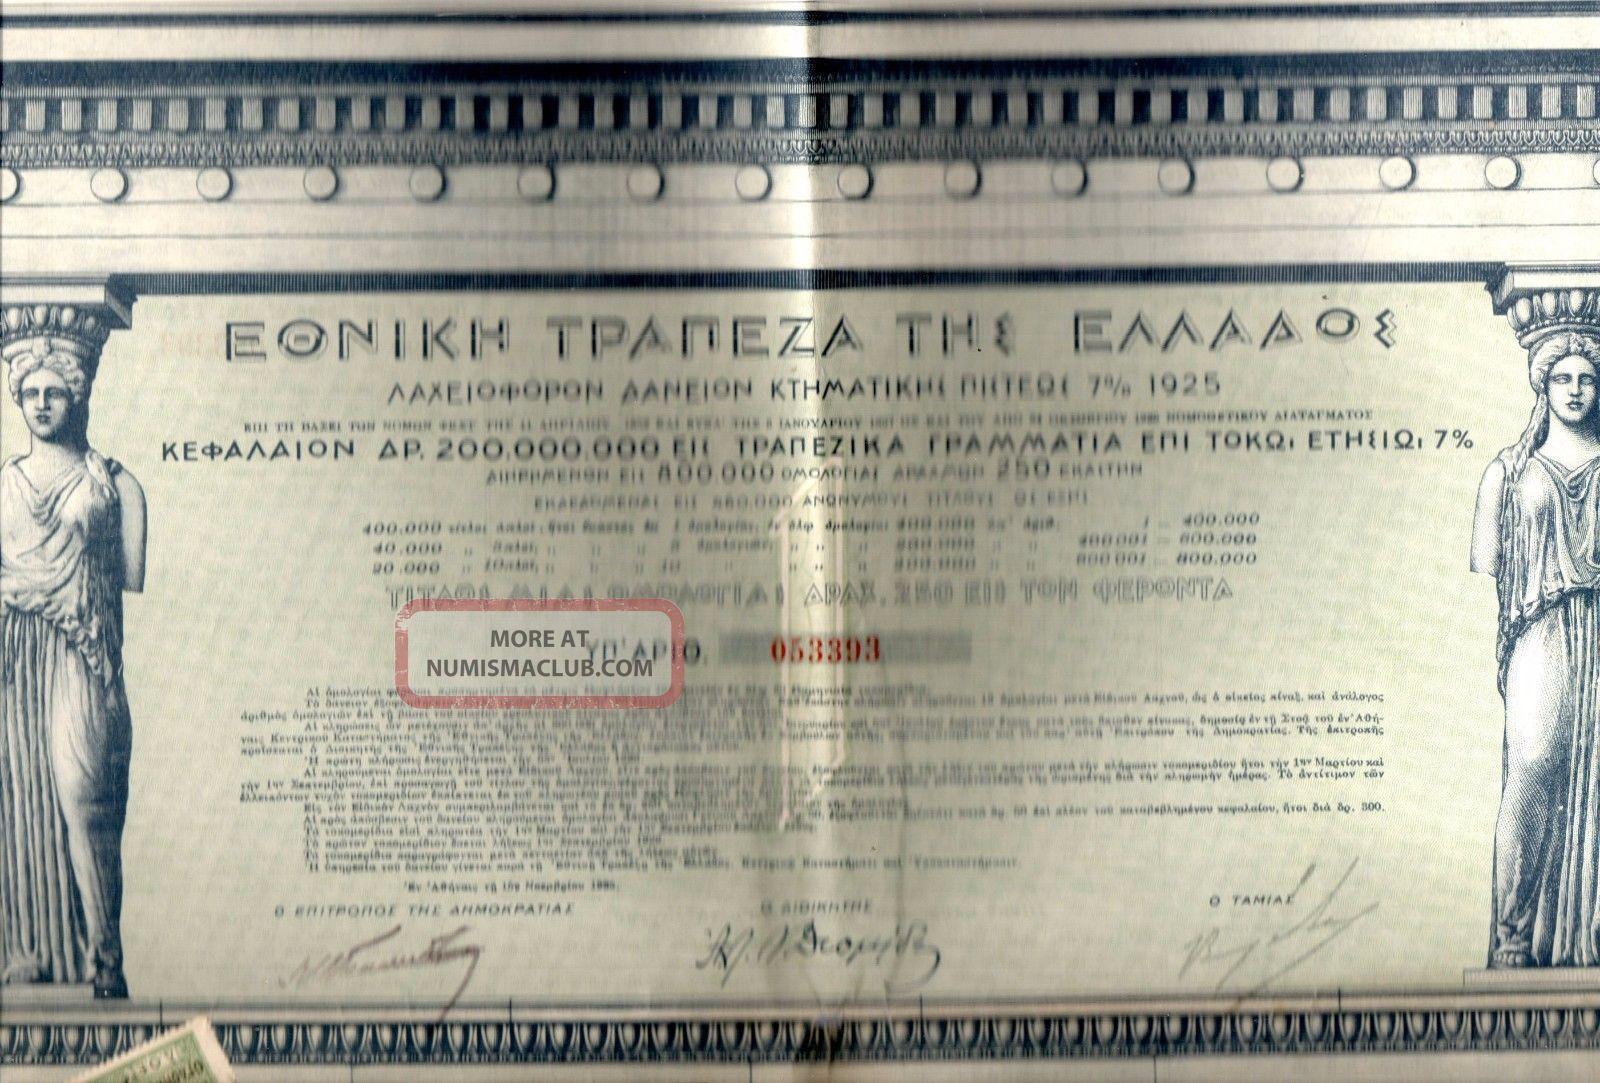 1 Bond 1925 Stock Certificate Bond,  Lotery Loan National Bank Of Greece,  No: 393 World photo